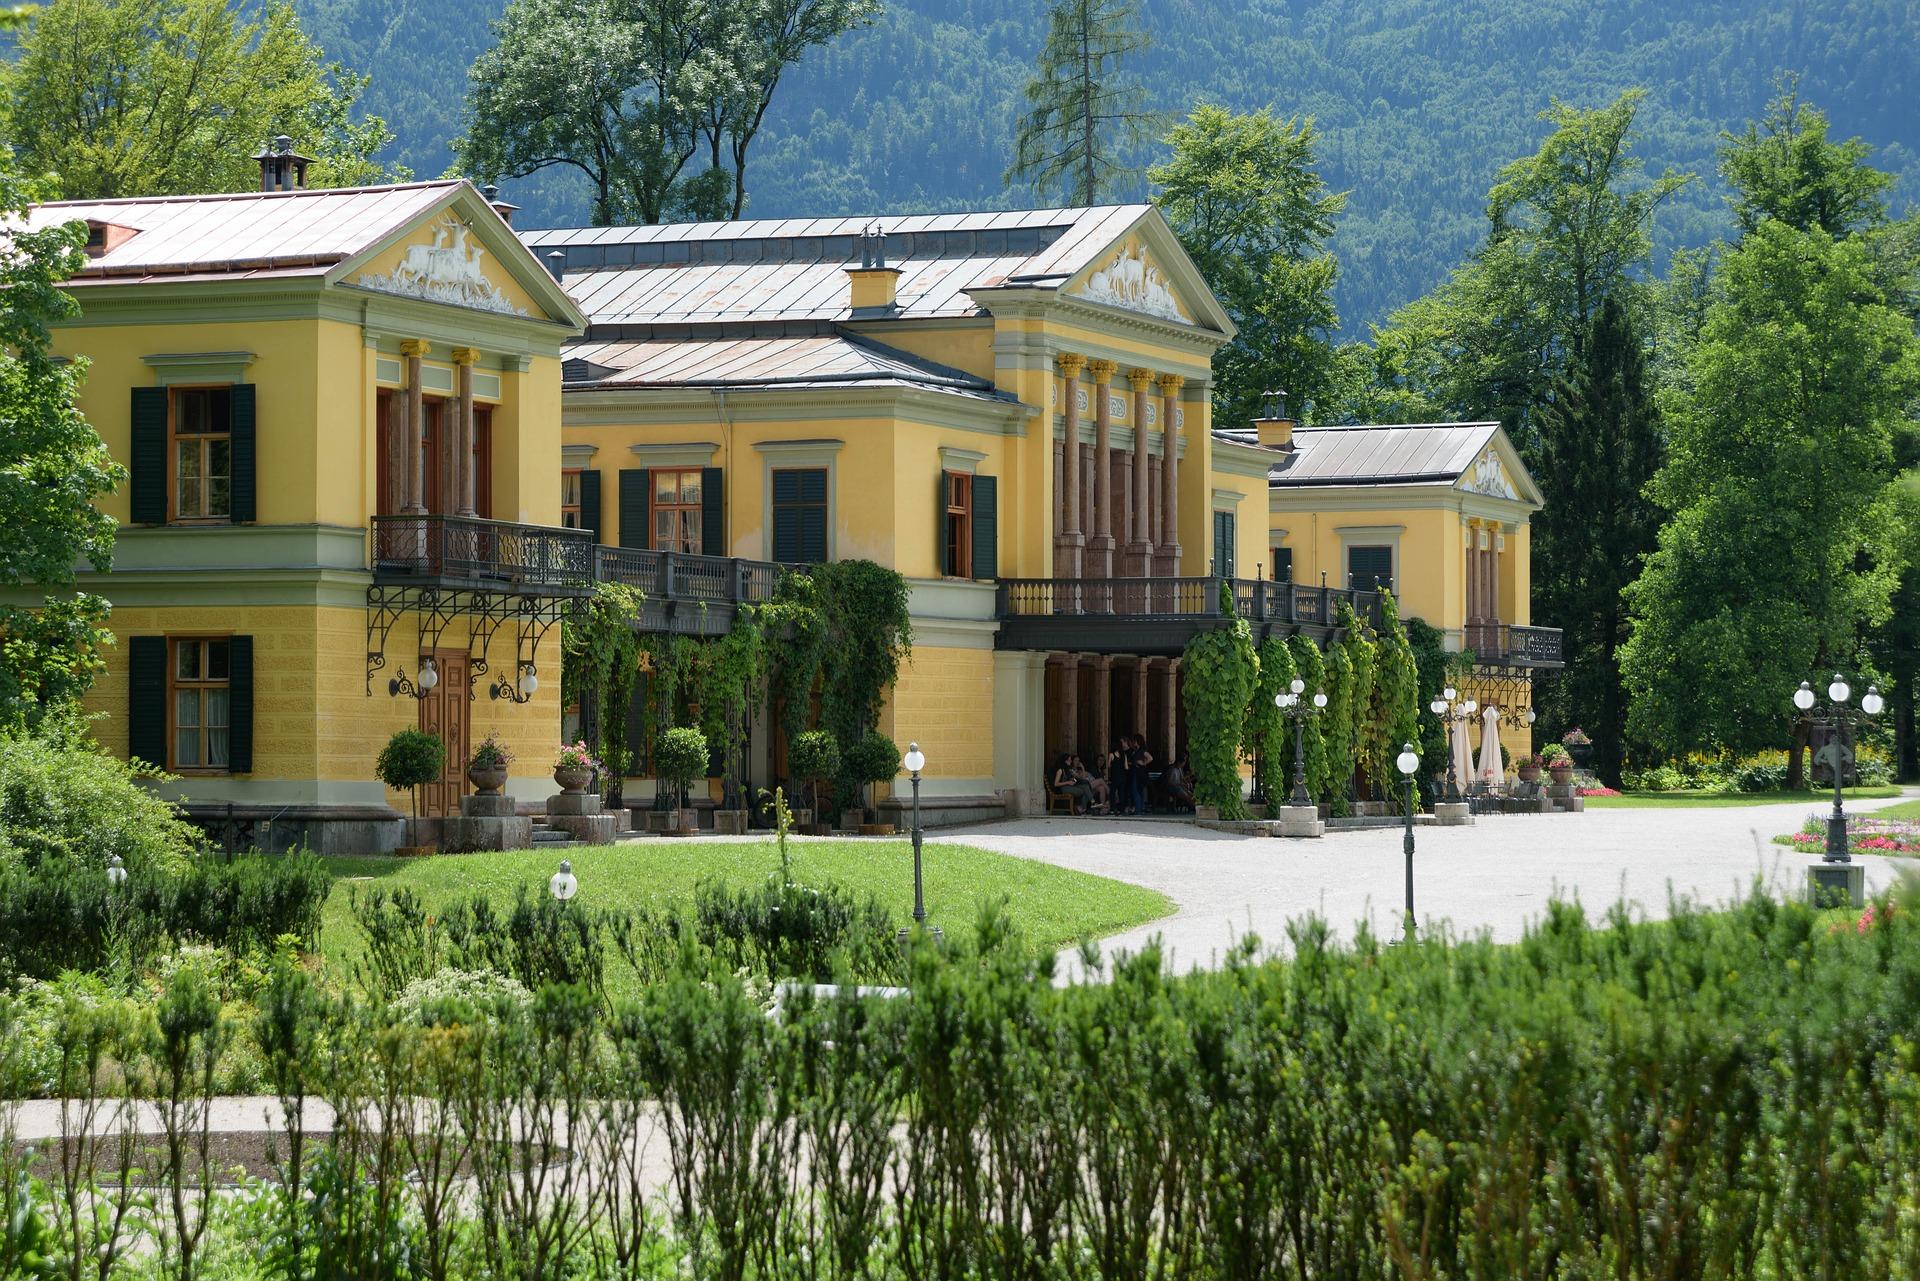 imperial-villa-2485537_1920